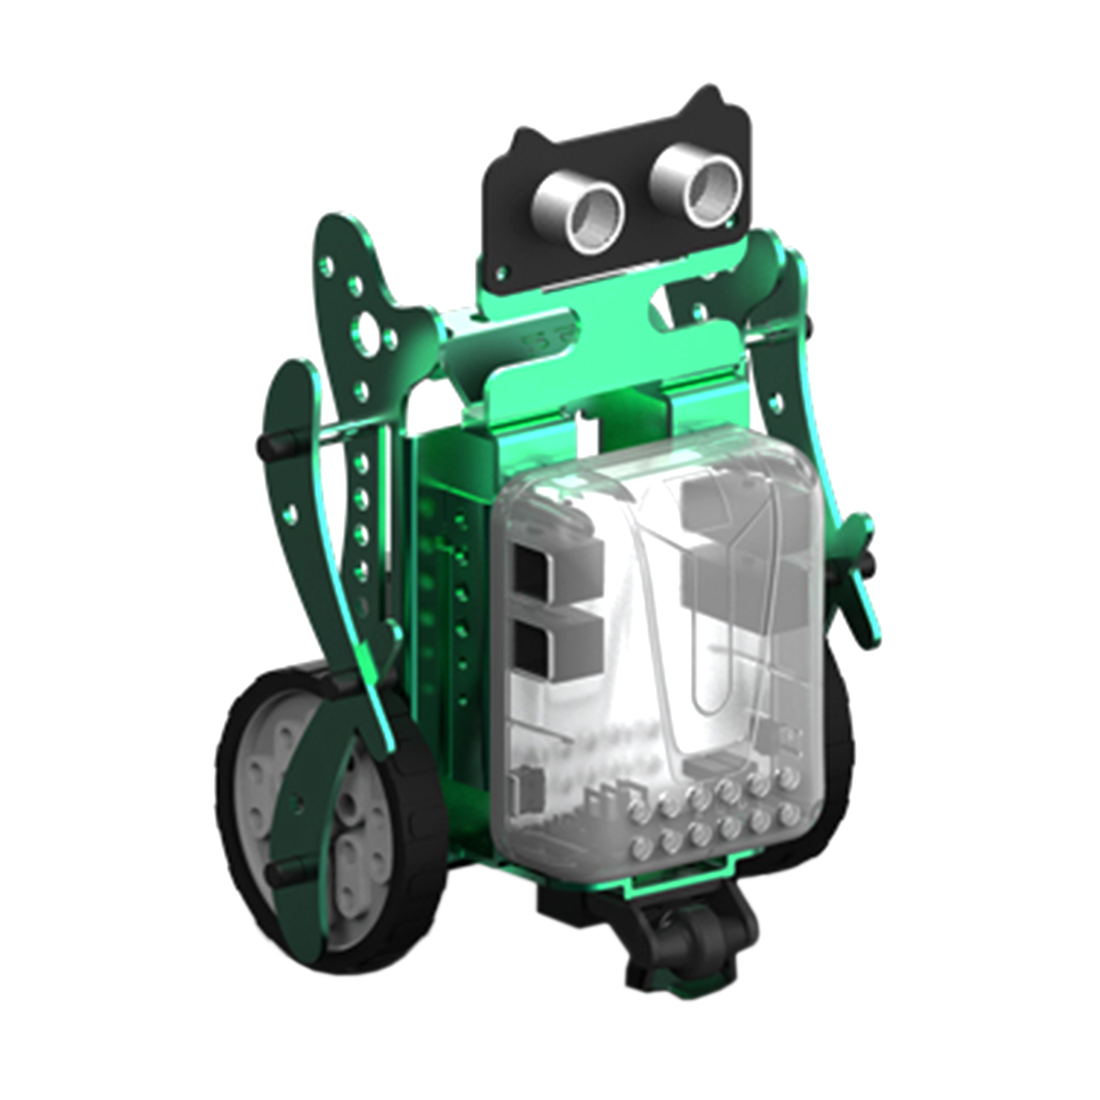 MODIKER 3-in-1 Kids High Tech DIY Programming Scratch Intelligent Obstacle Avoidance Car Robot Kit Programmable Toys- Green